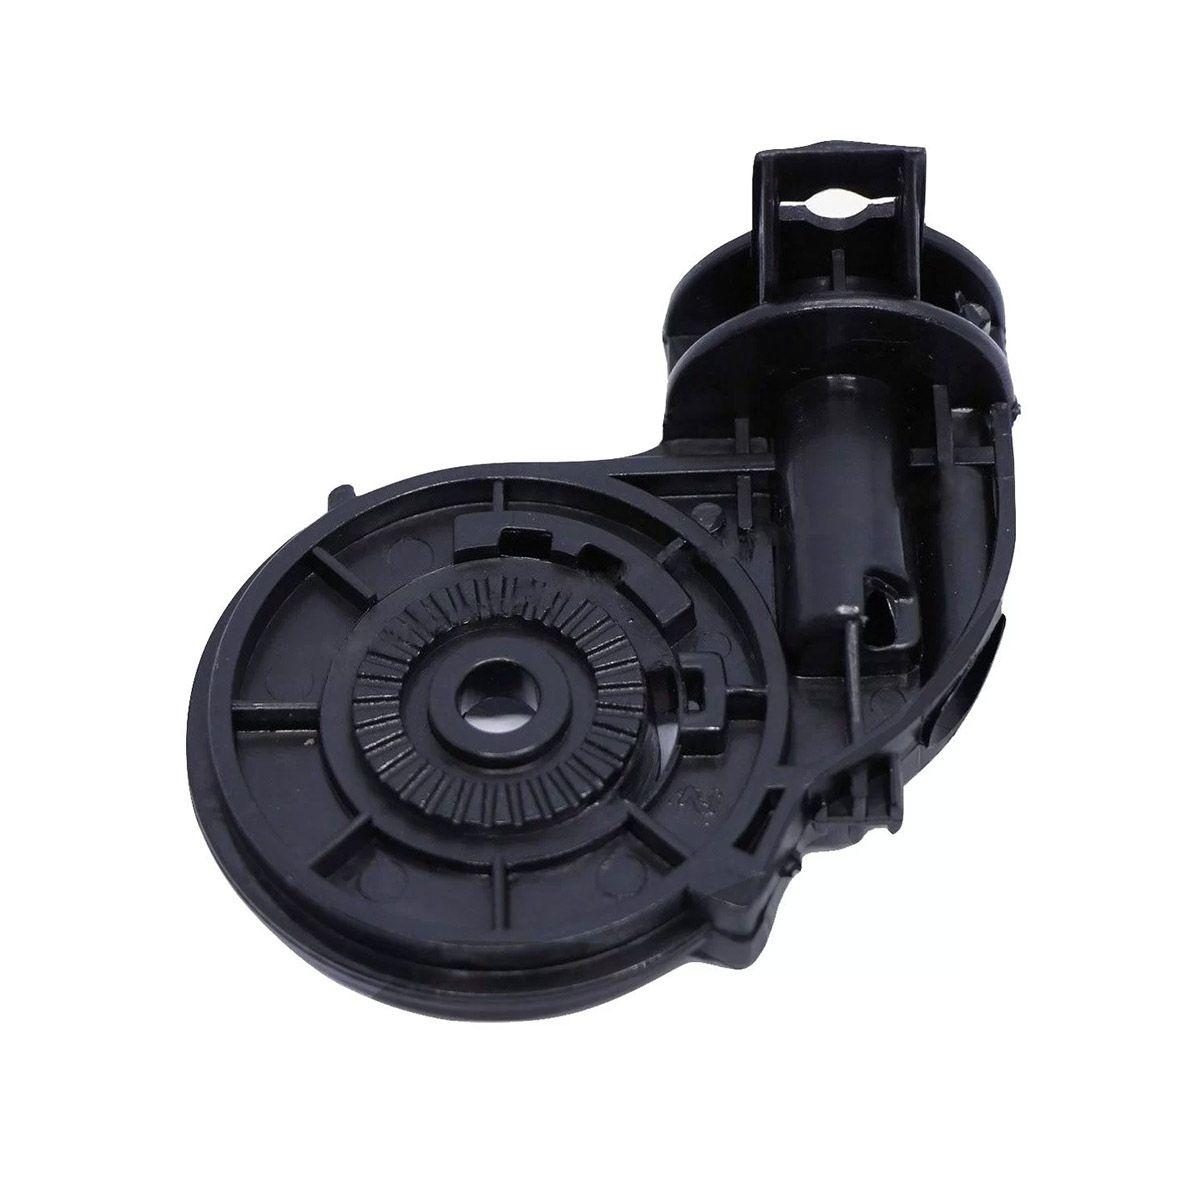 Suporte Motor Ventilador Cadence Vtr407 Vtr461 VTR470 VTR801